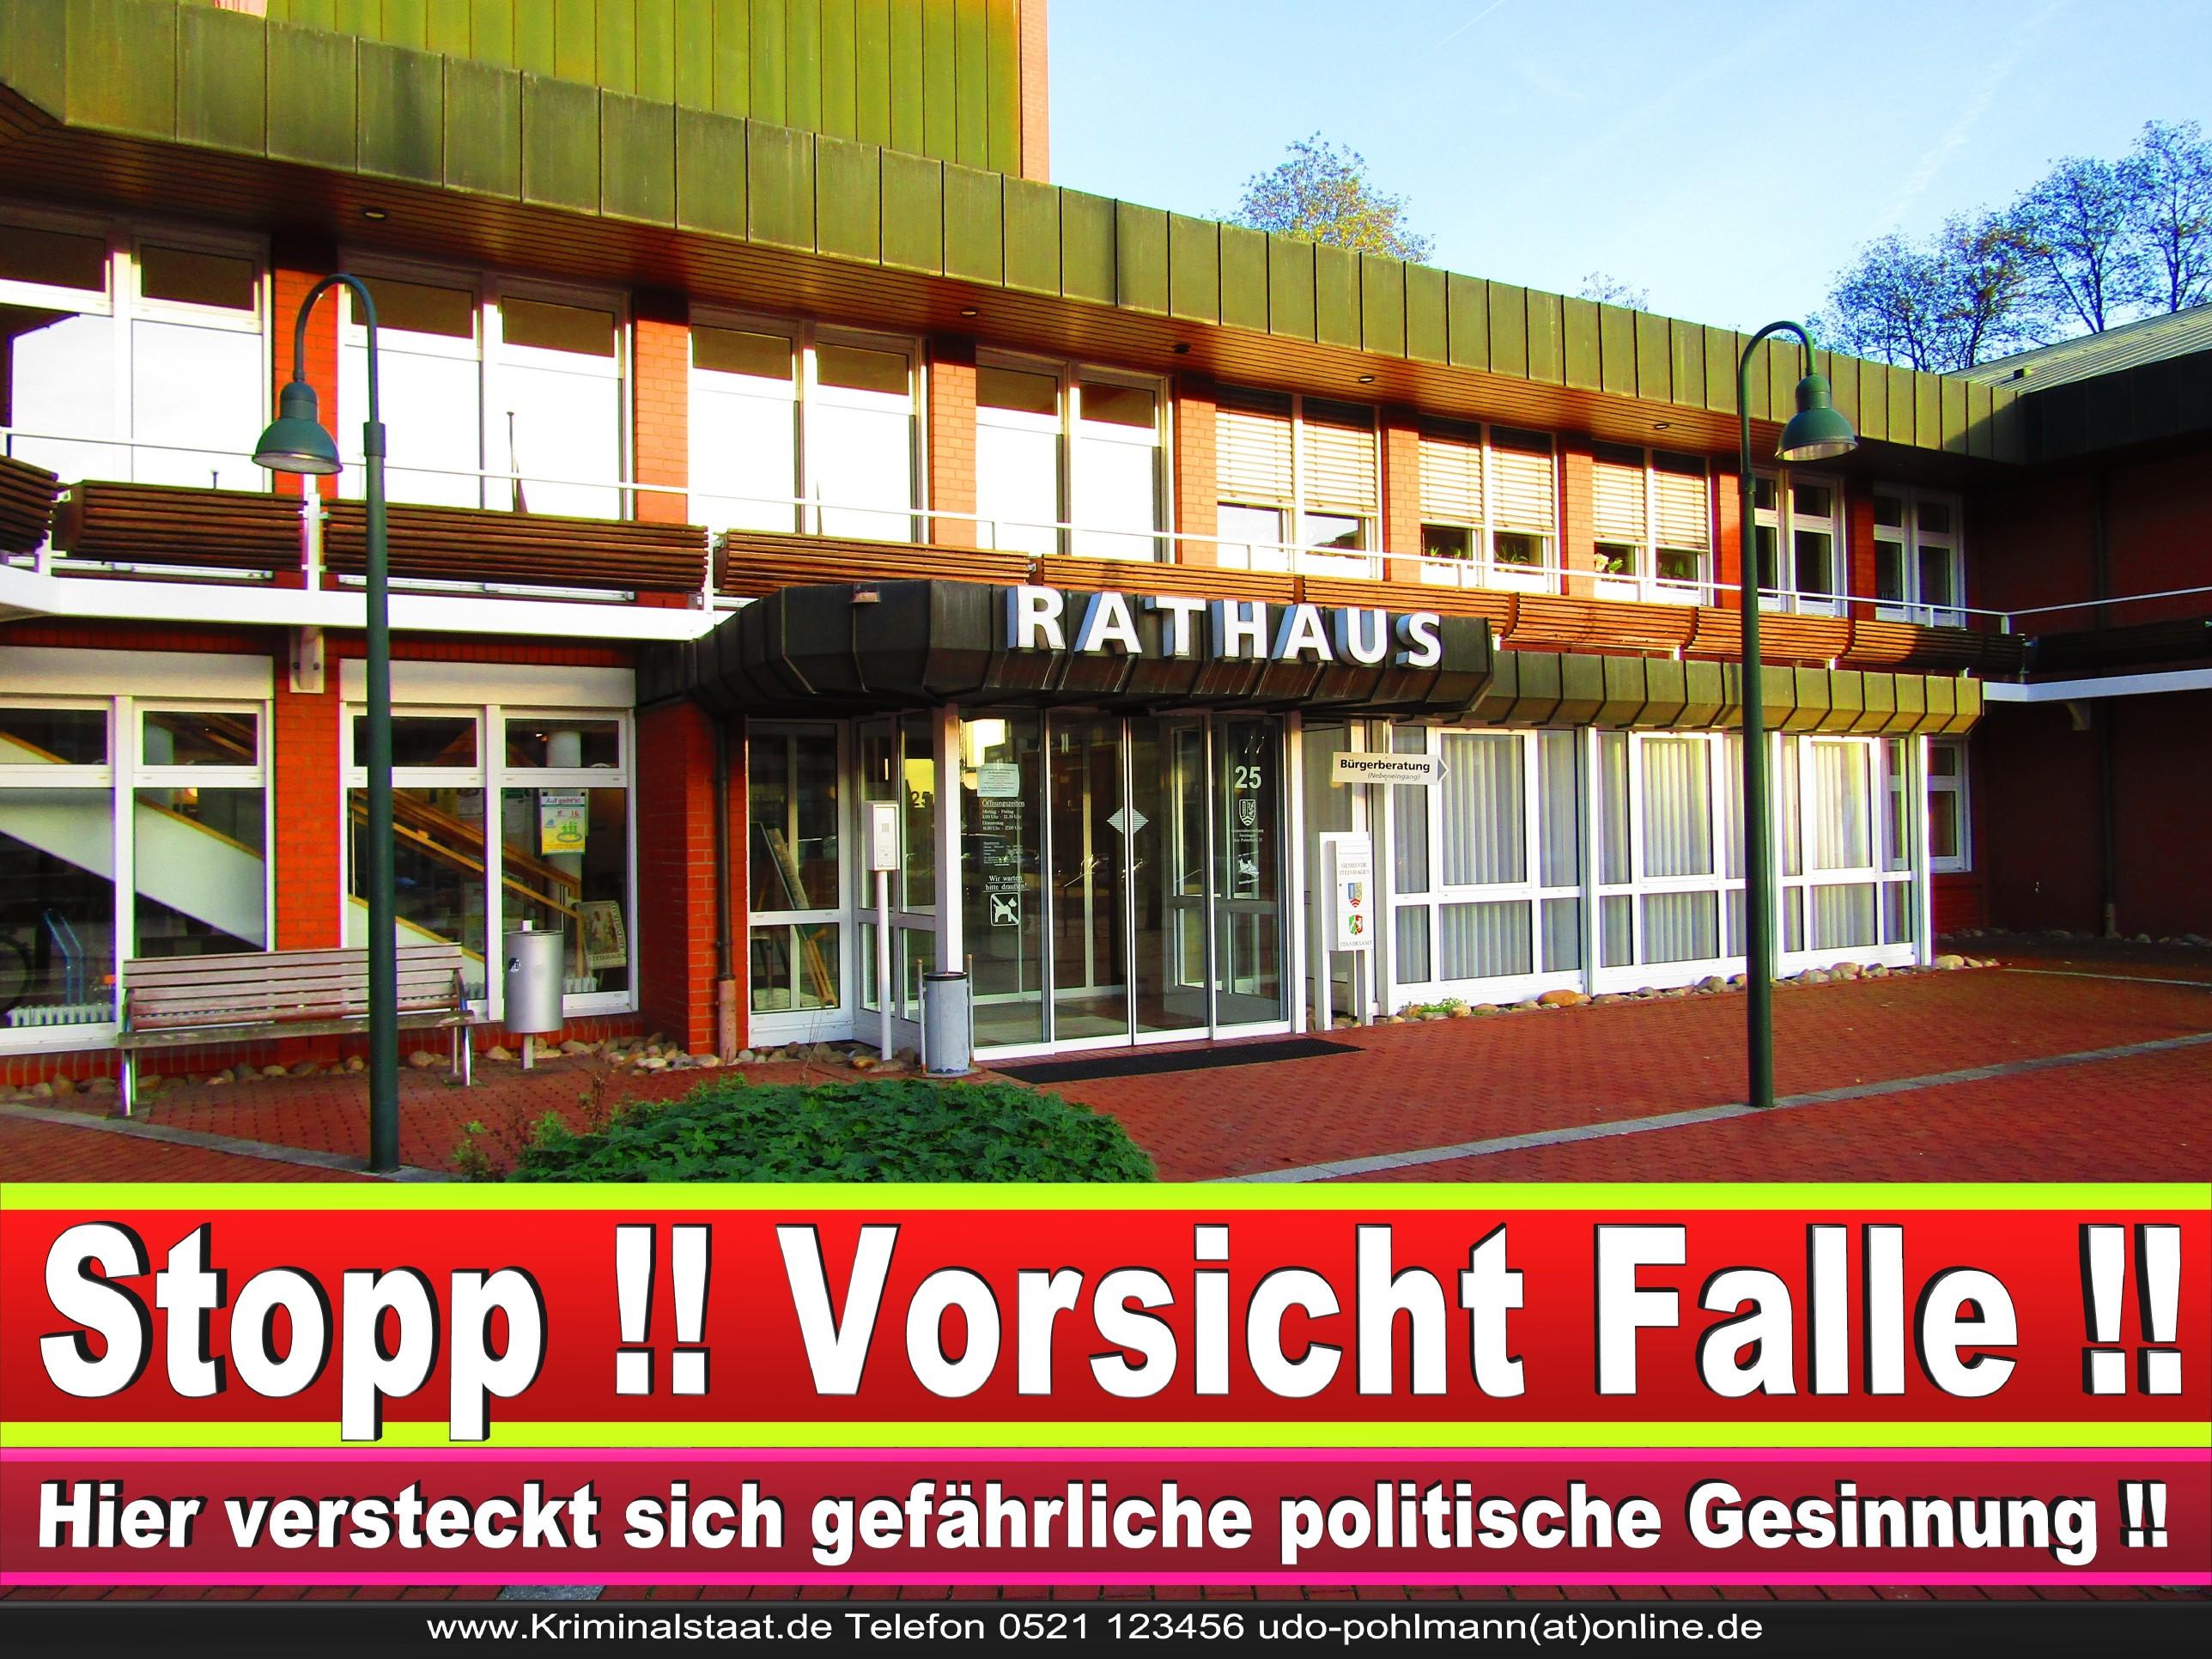 Rathaus Steinhagen CDU SPD FDP Ortsverband CDU Bürgerbüro CDU SPD Korruption Polizei Bürgermeister Karte Telefonbuch NRW OWL (19)